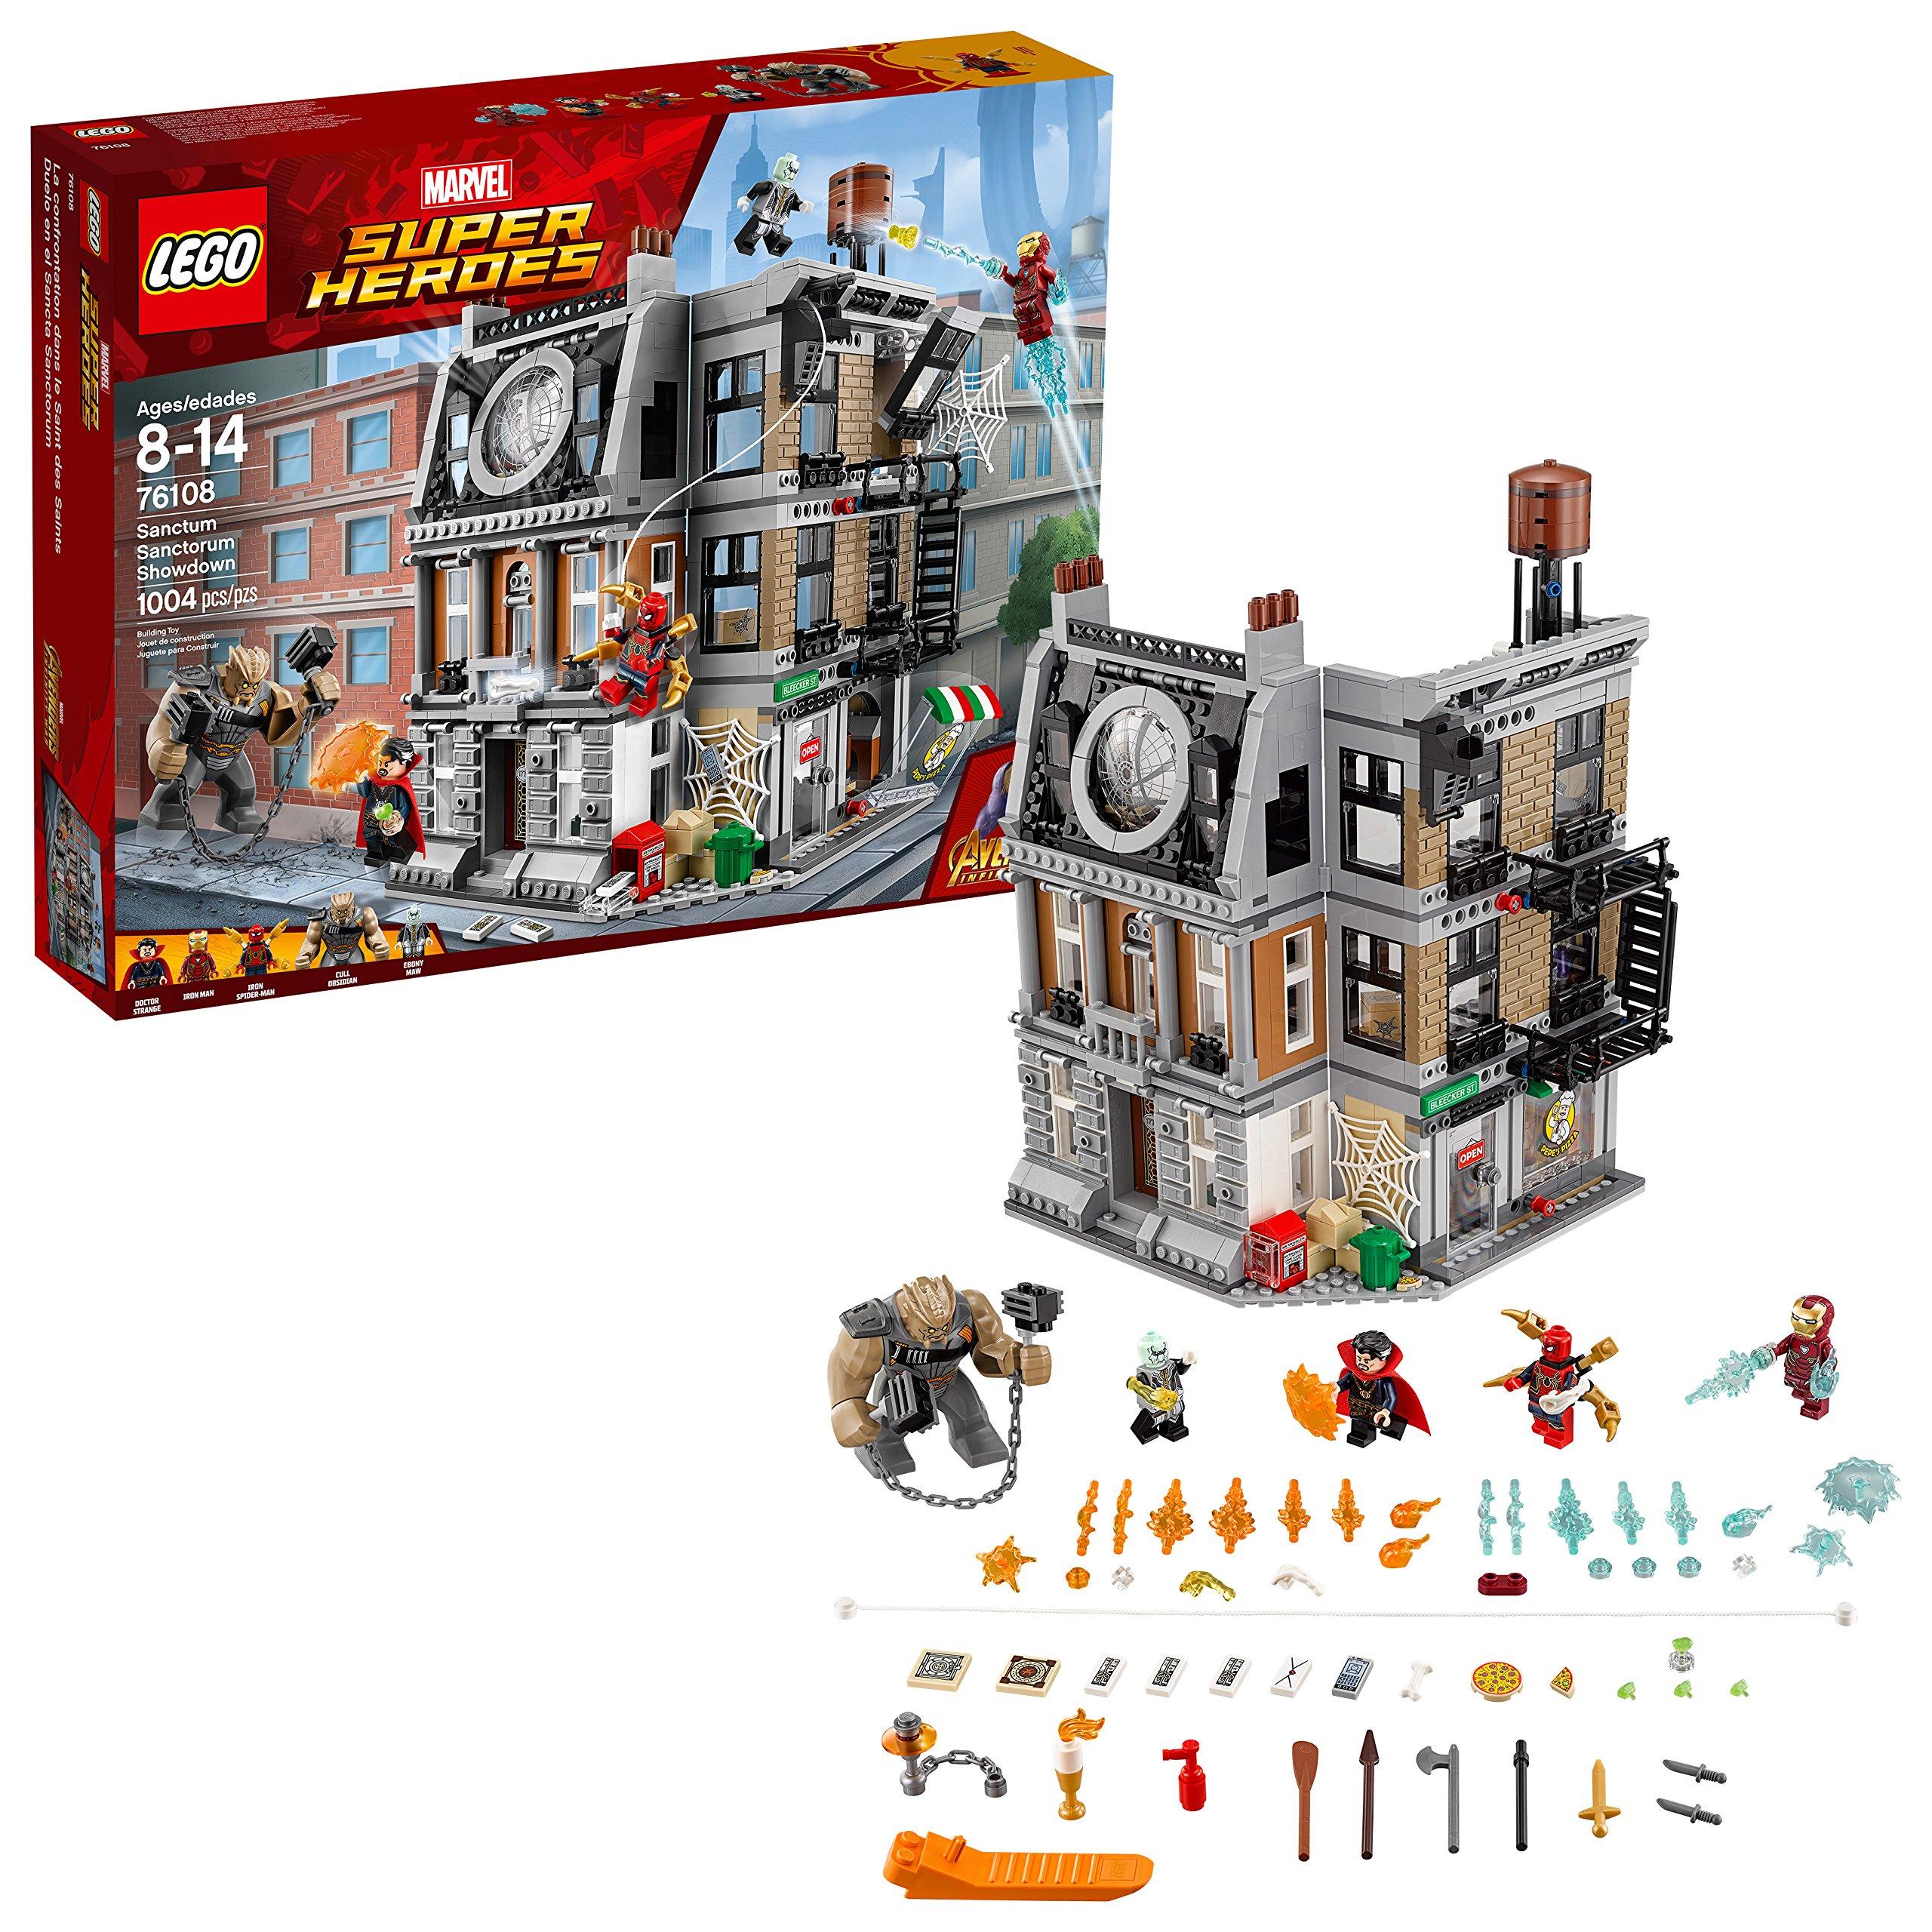 Sanctum Showdown War Kit1004 Sanctorum Building Marvel Heroes Lego Piece 76108 Super AvengersInfinity shCdtQr